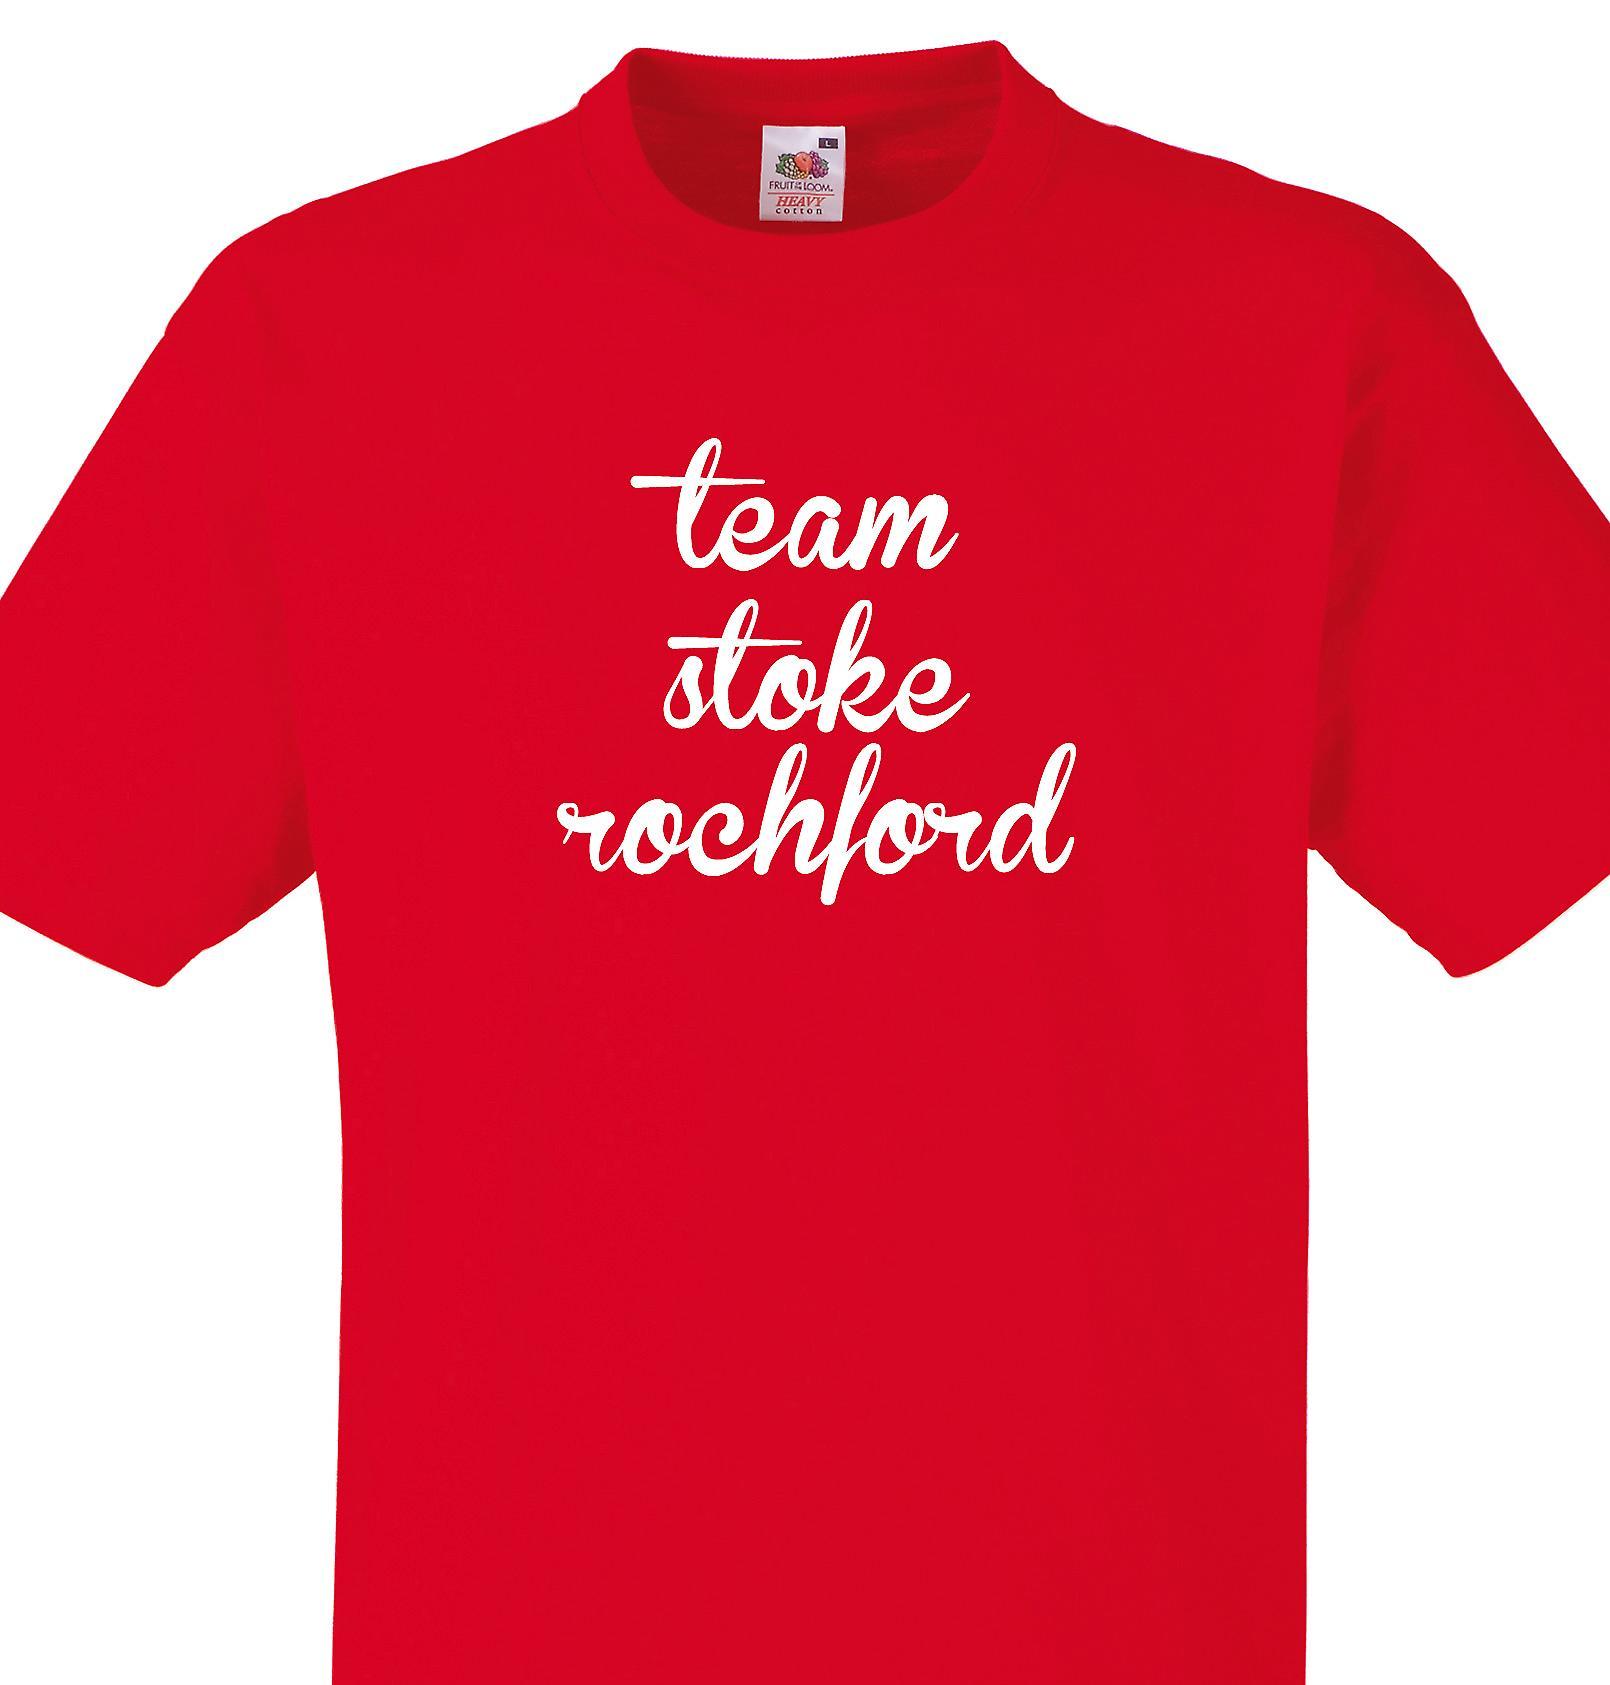 Team Stoke rochford Red T shirt